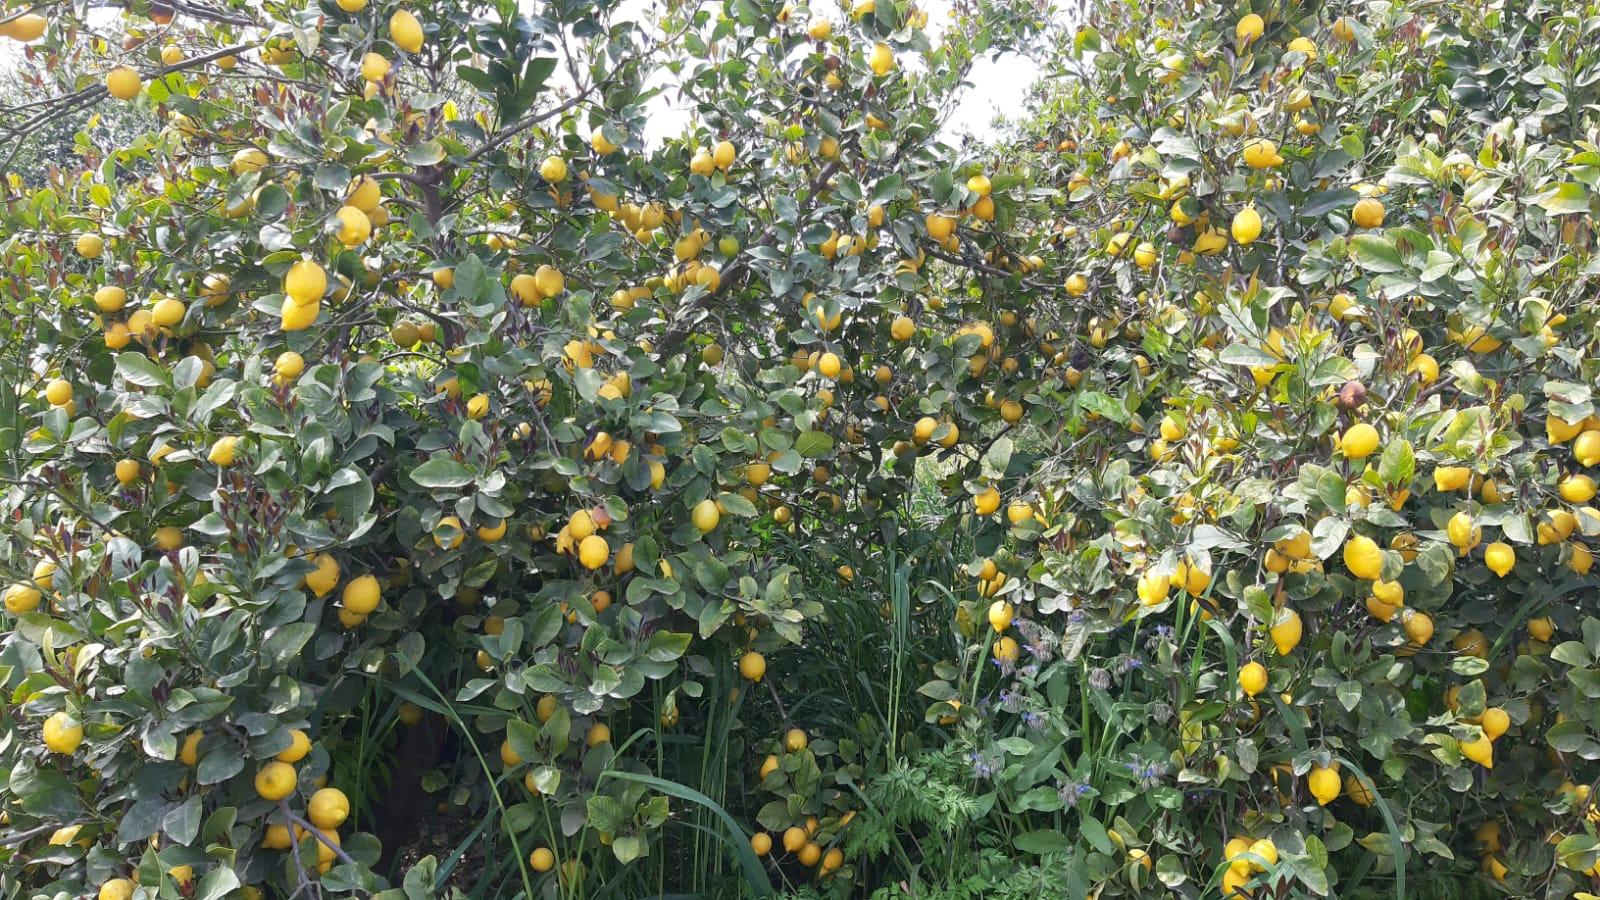 Campos de limón con limones en las ramas